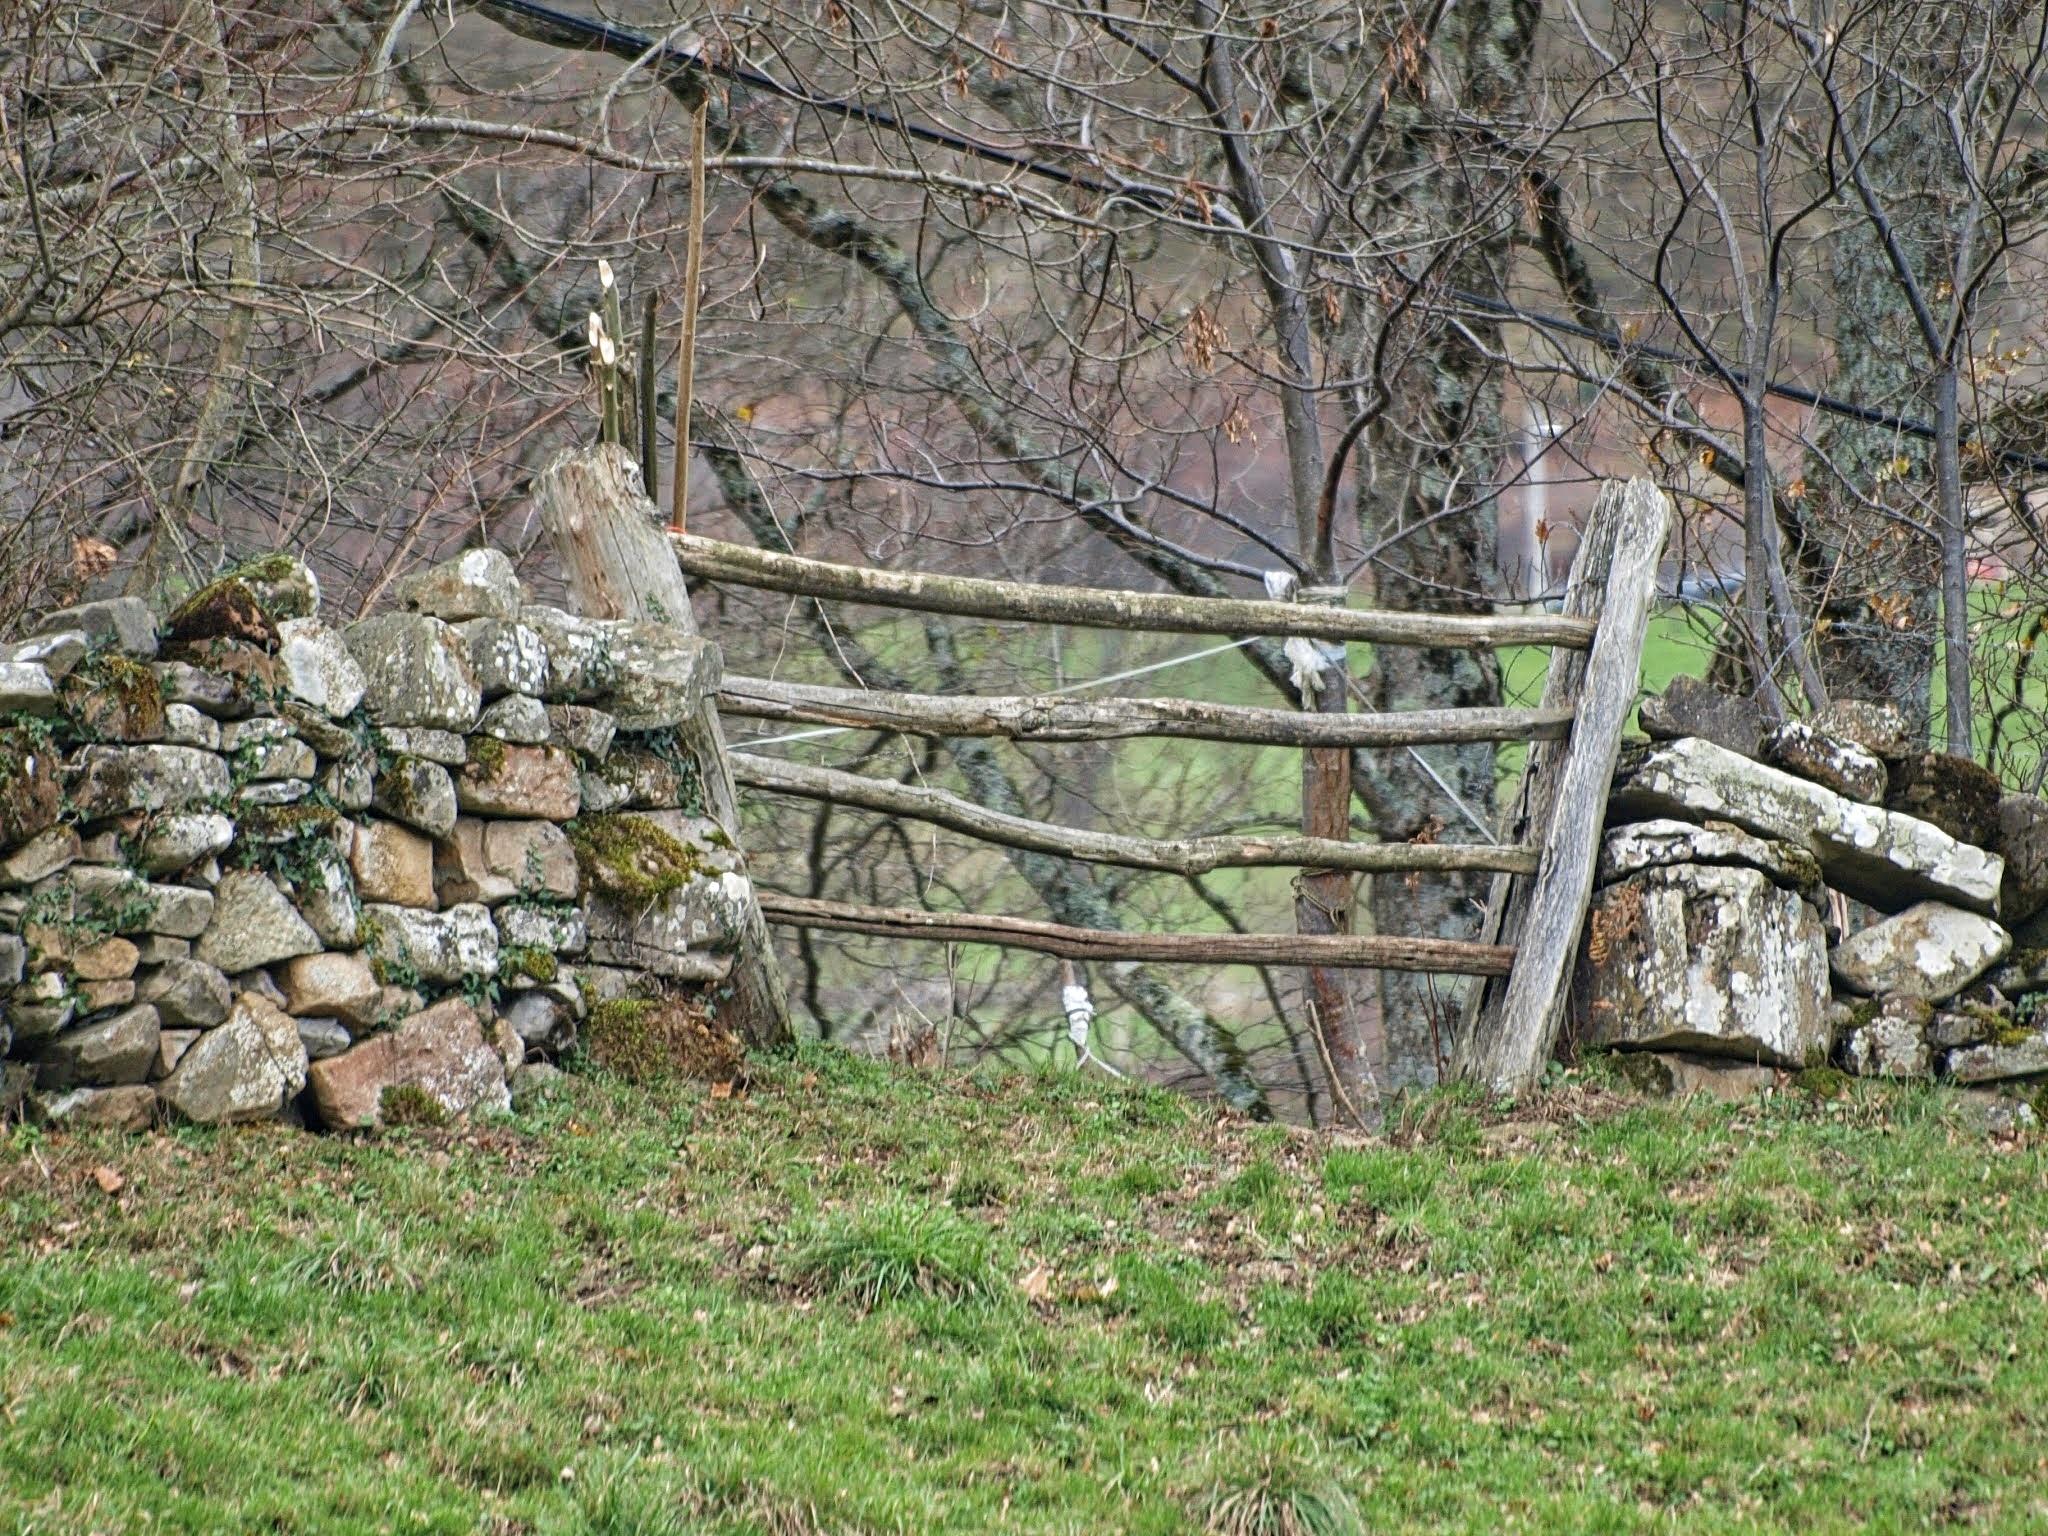 Kostenlose foto : Landschaft, Baum, Natur, Gras, Rock, Ast, Zaun ...